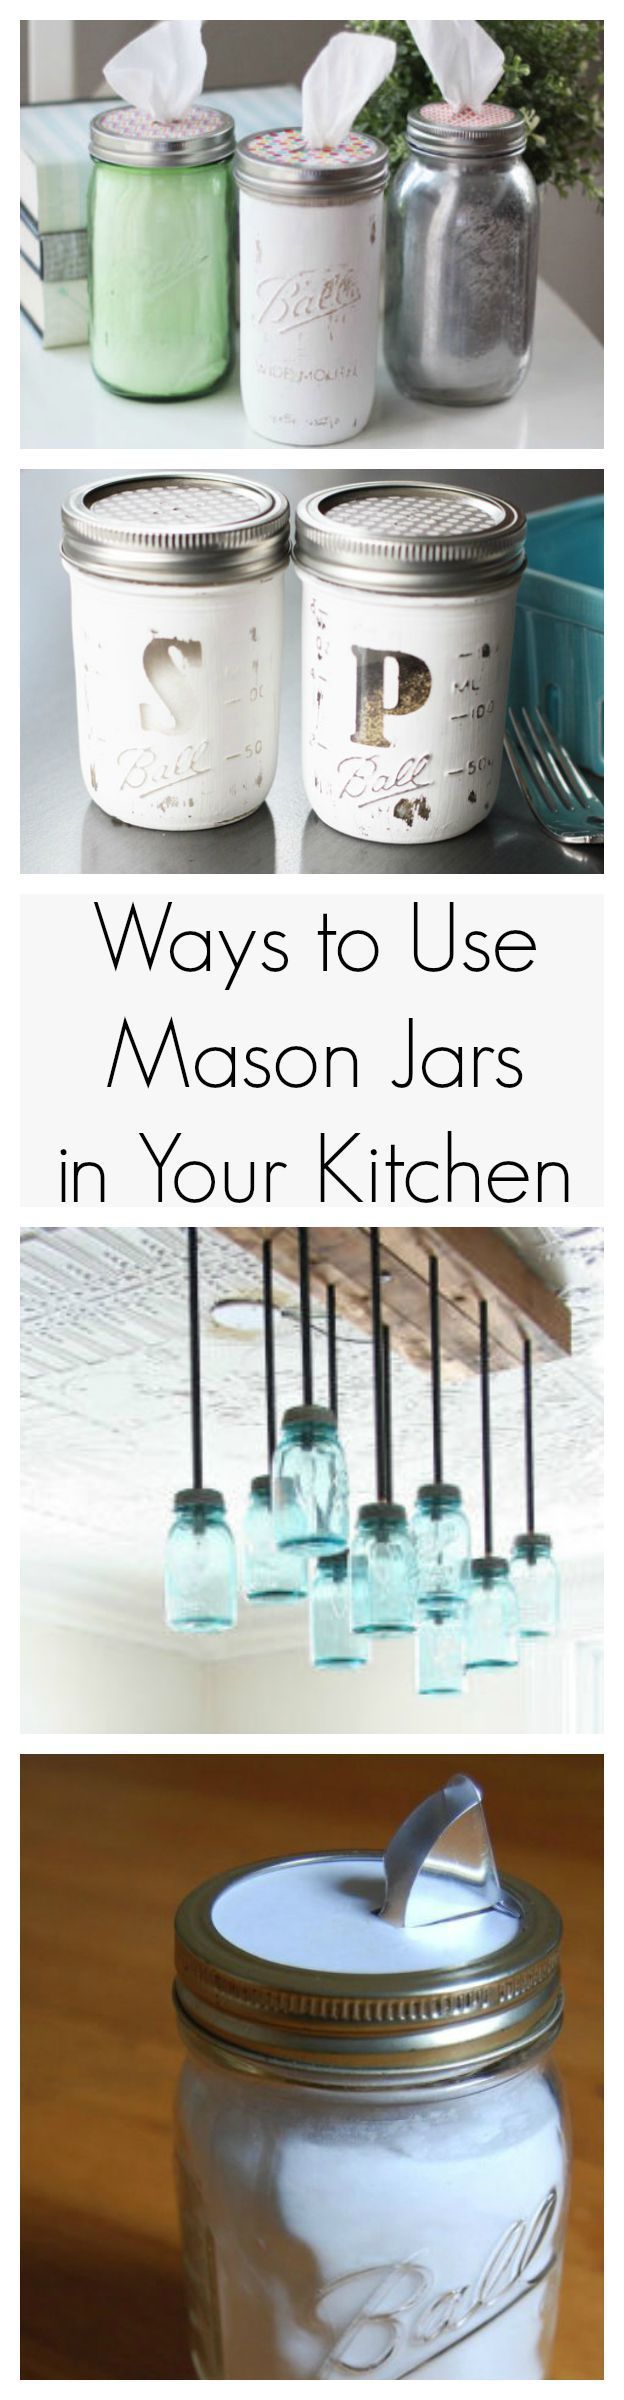 12 Creative #DIY Ideas for the #Kitchen #diydecor